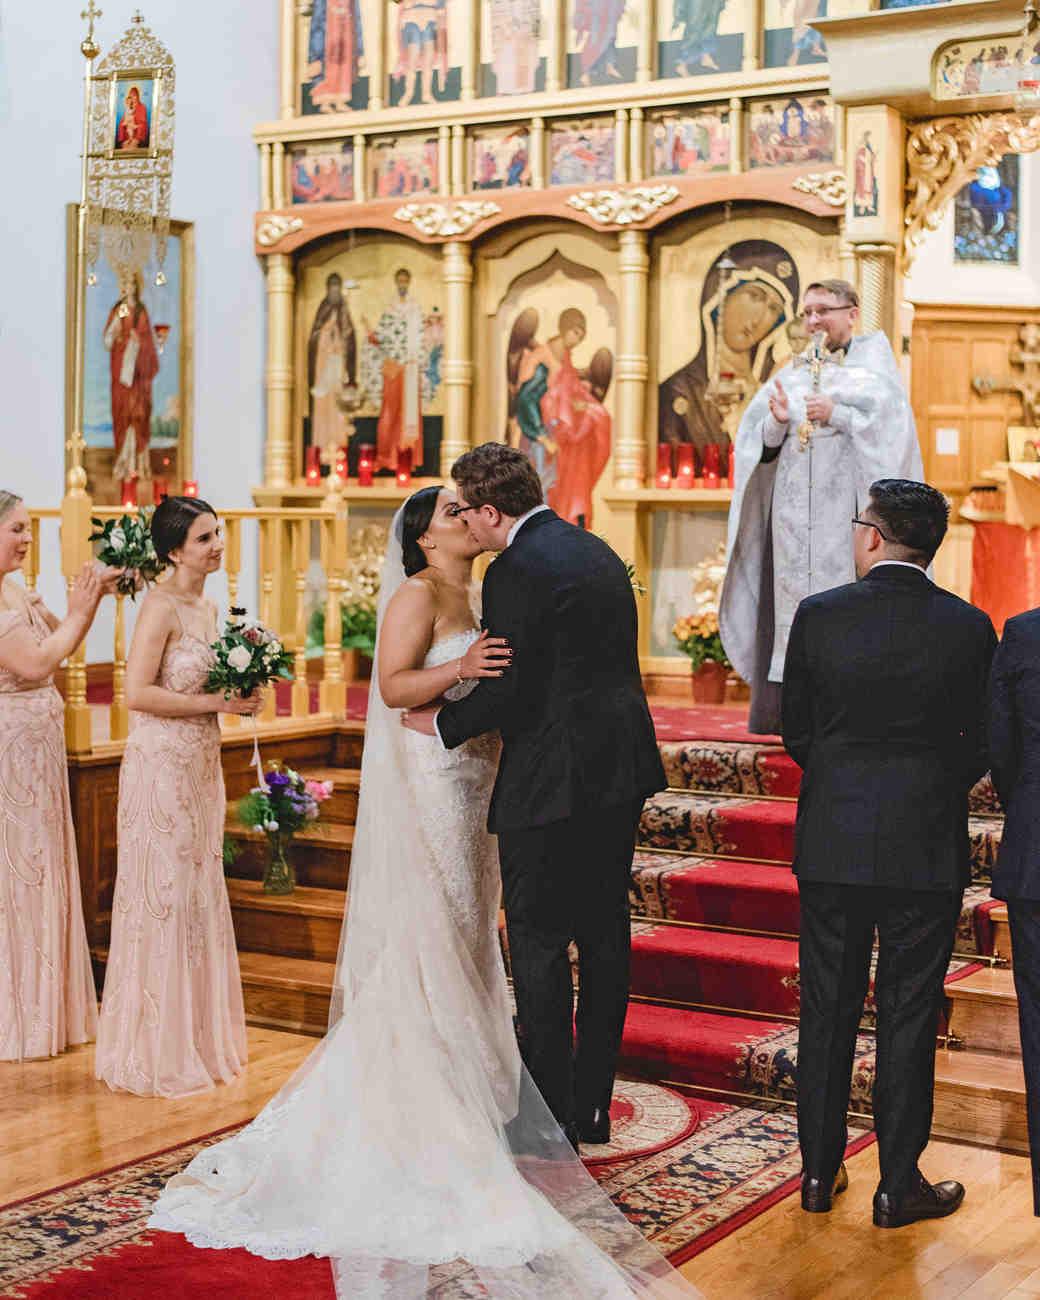 daniela andrei wedding ceremony